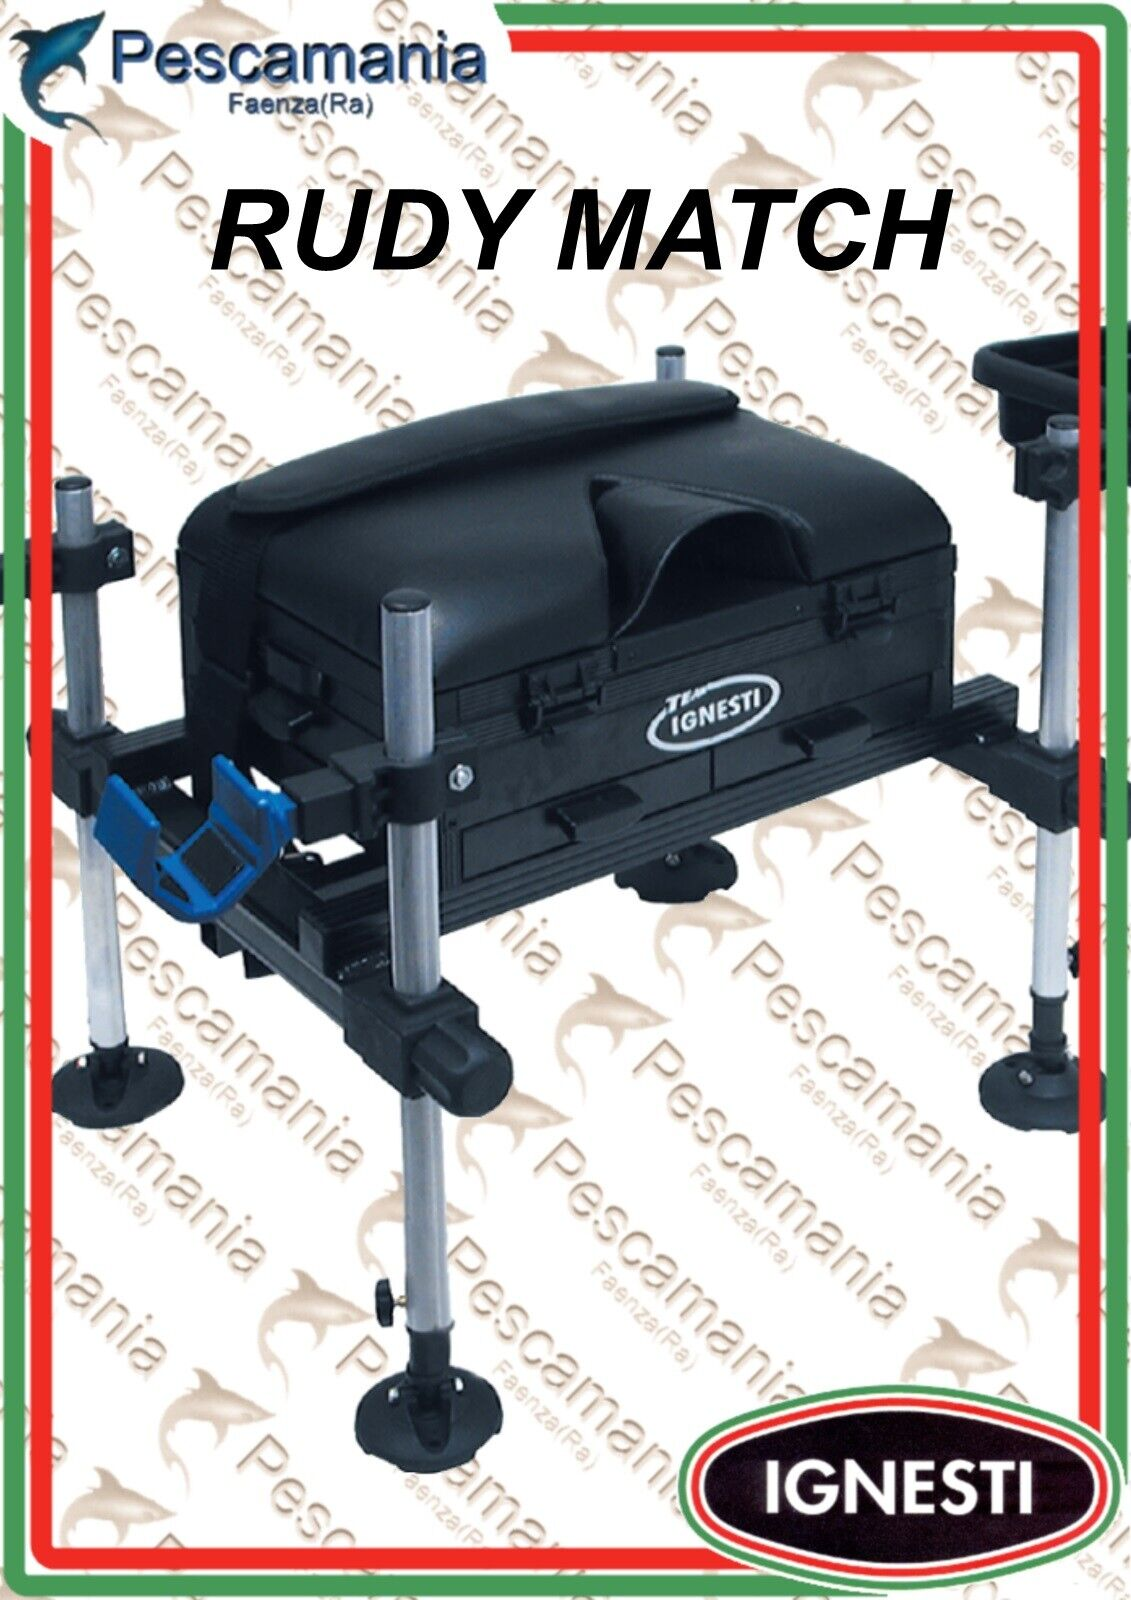 Korb Ignesti RUDY MATCH - Beine ø25mm - gerade Seite